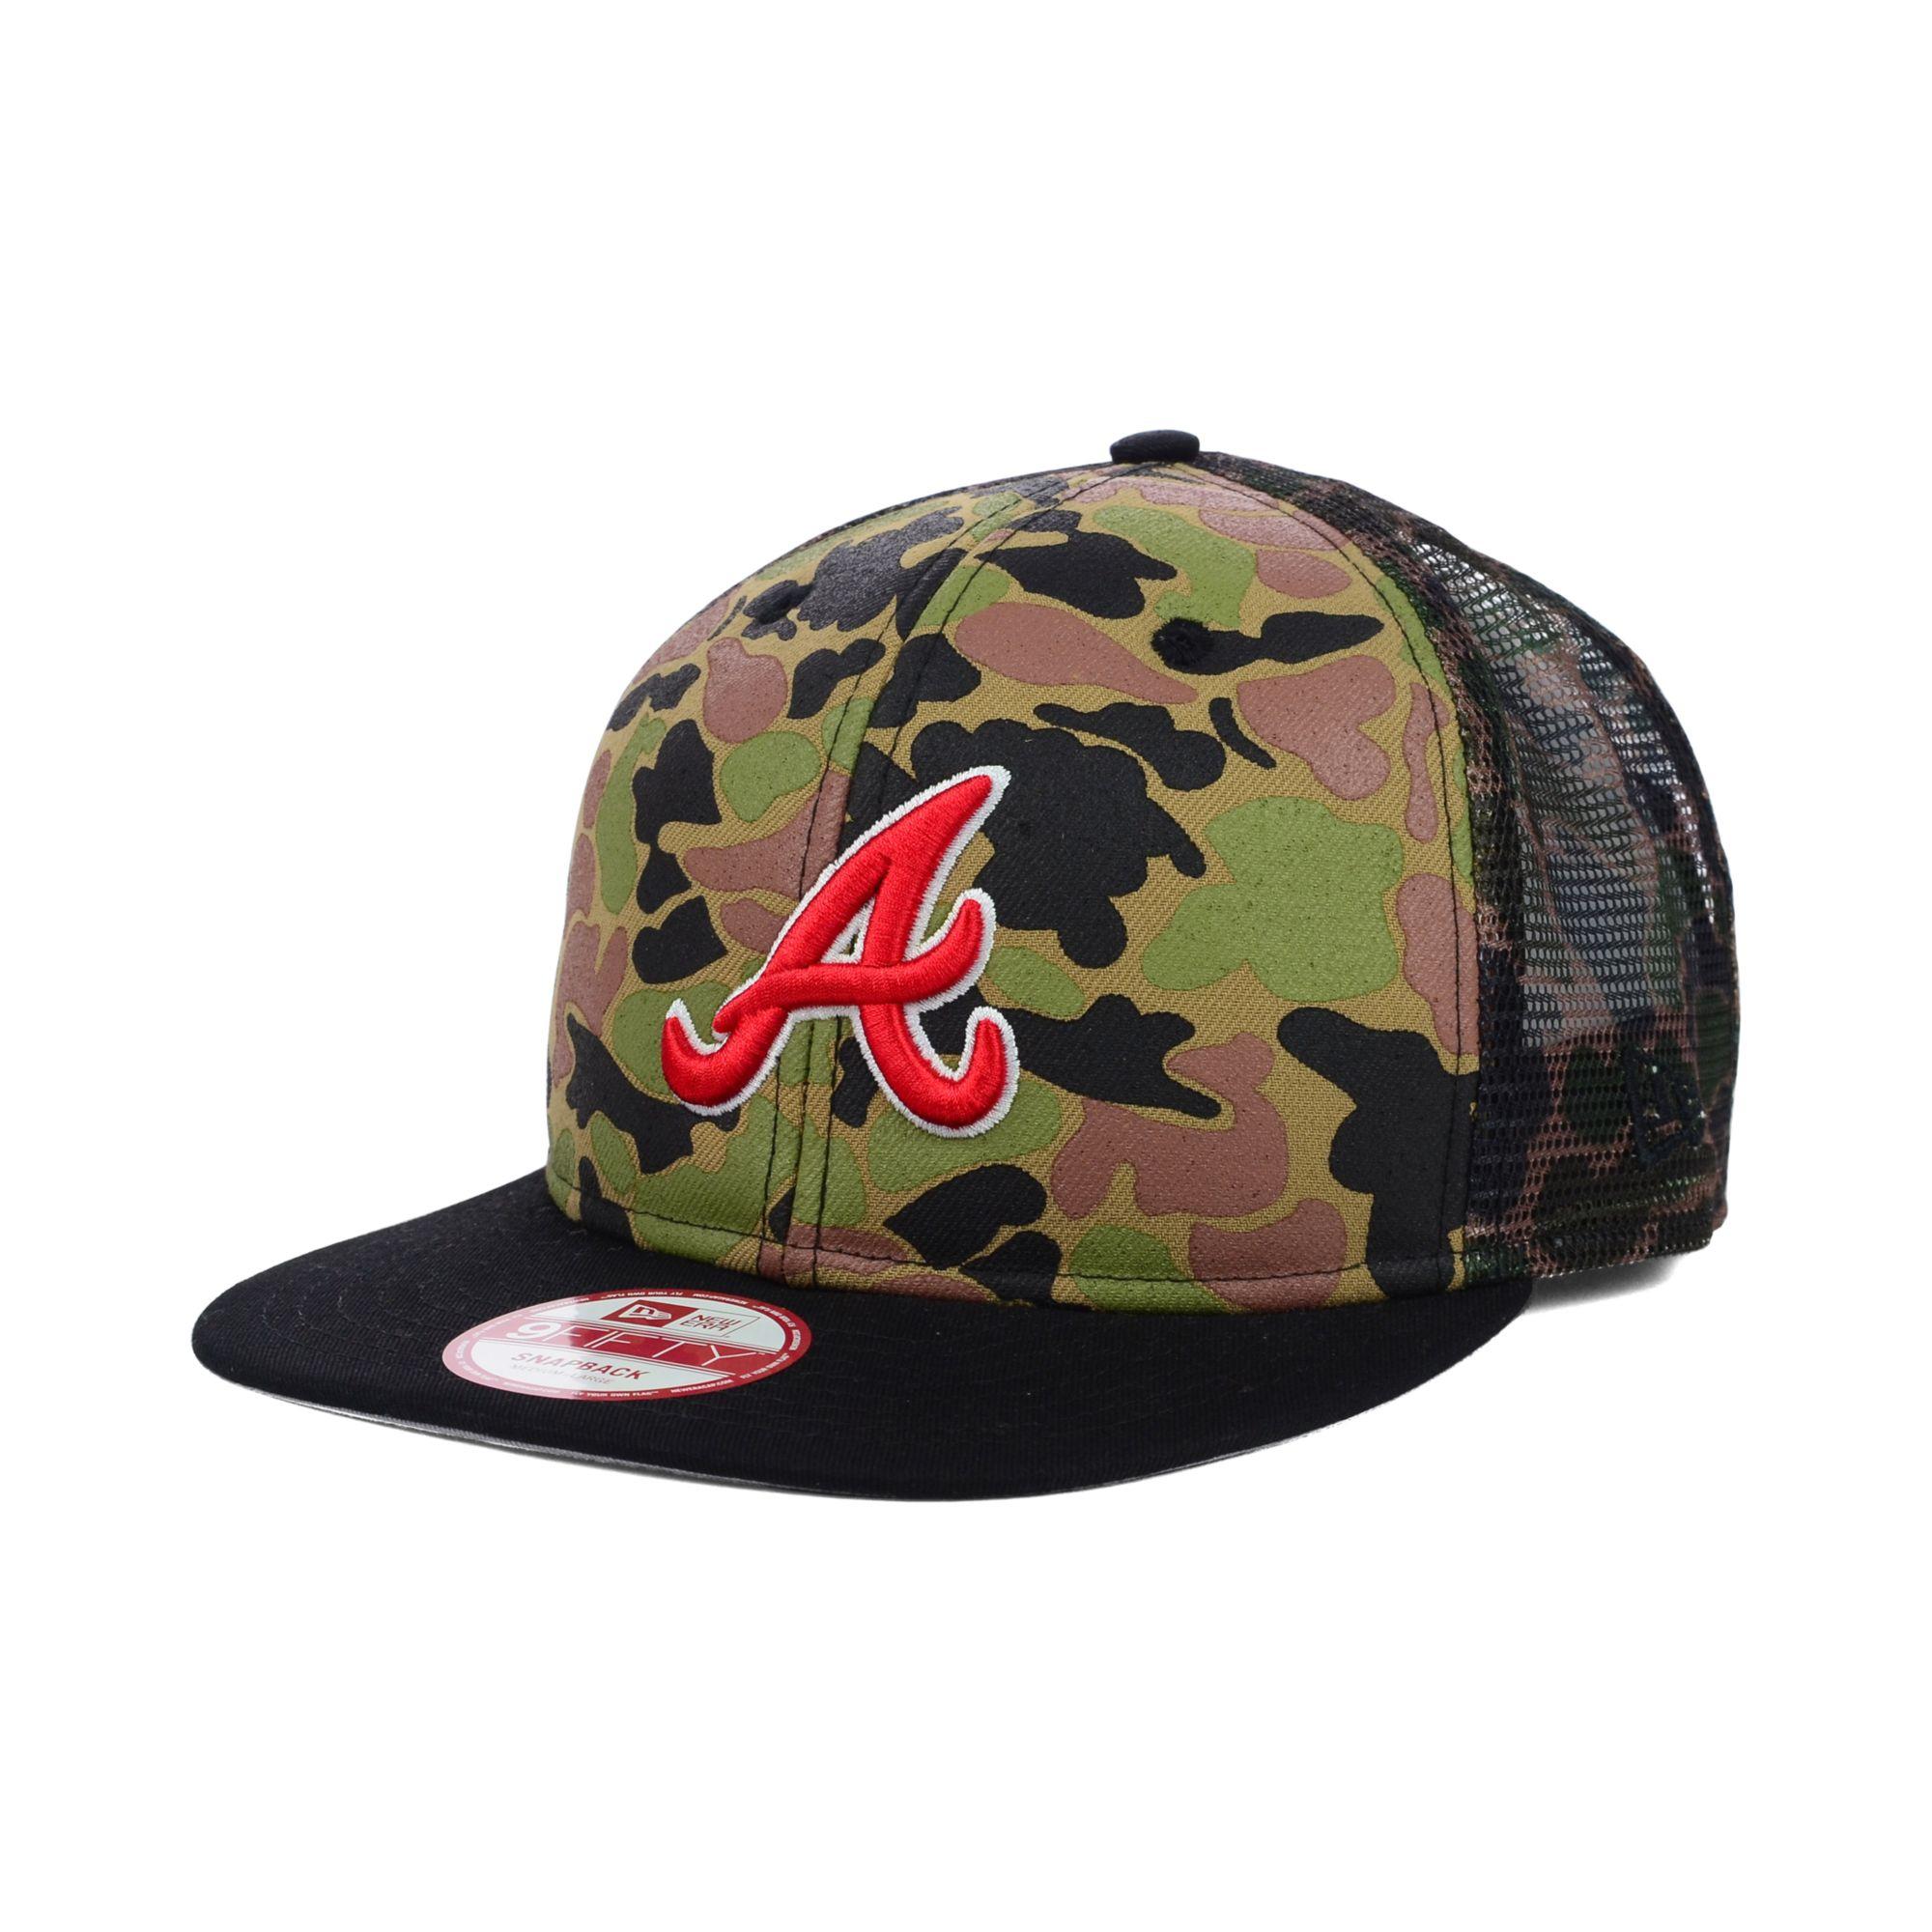 b24bbe696c1 Gallery. Previously sold at  Macy s · Men s Snapbacks Men s Baseball Caps  ...